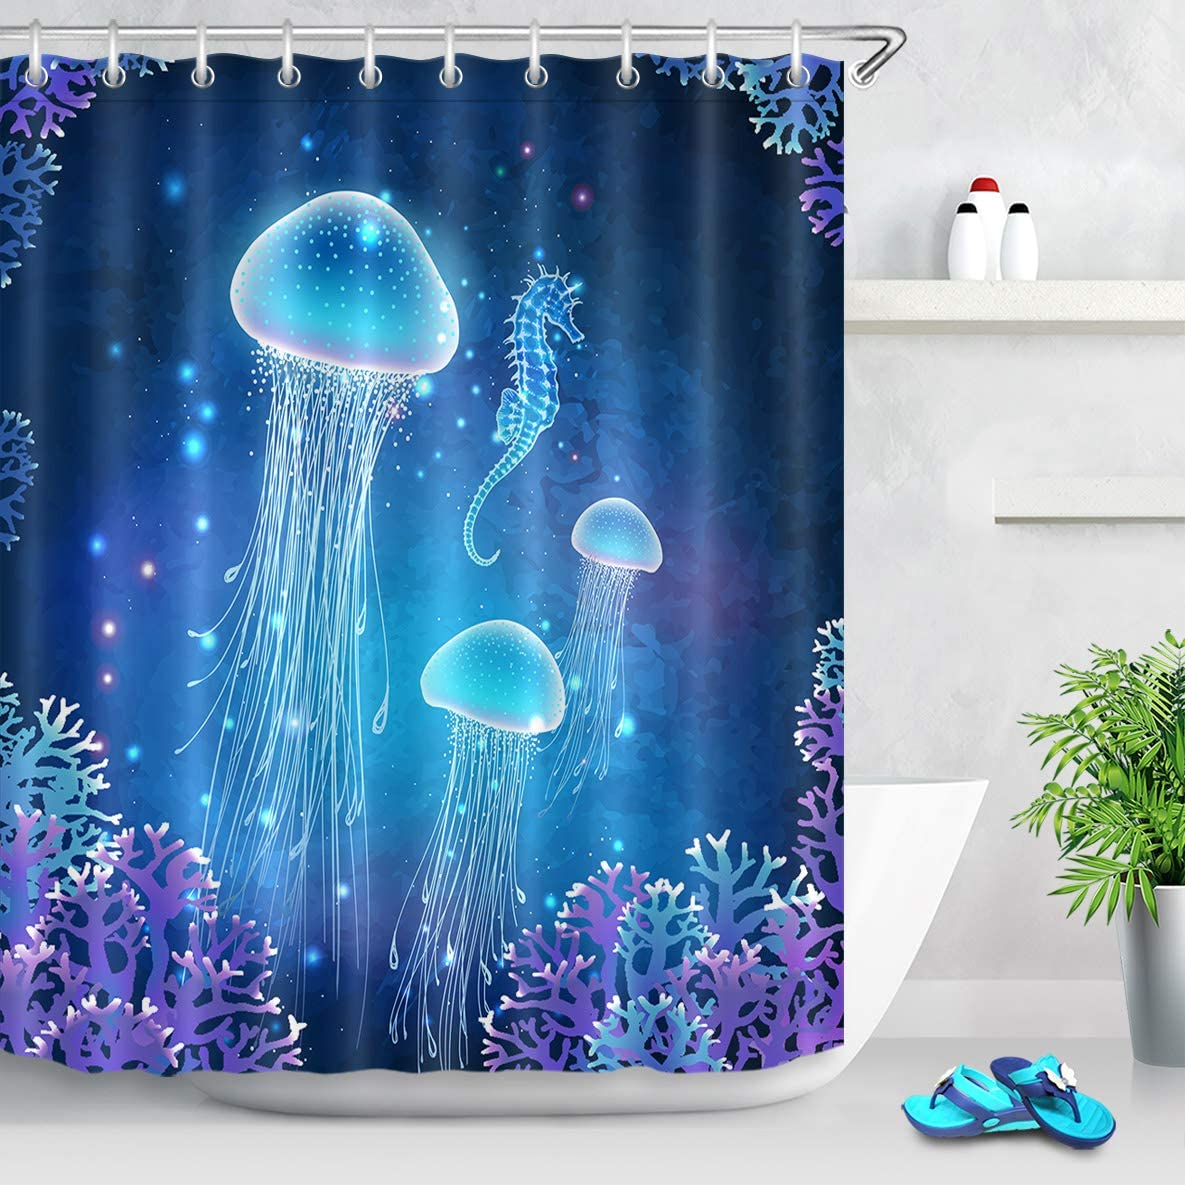 LB Magic Jellyfish Shower Curtain Blue Medusa Underwater Sea Life Shower Curtain Kids Funny Aquatic Bathroom Set,Waterproof Fabric 60x72 Inch with 12 Hooks